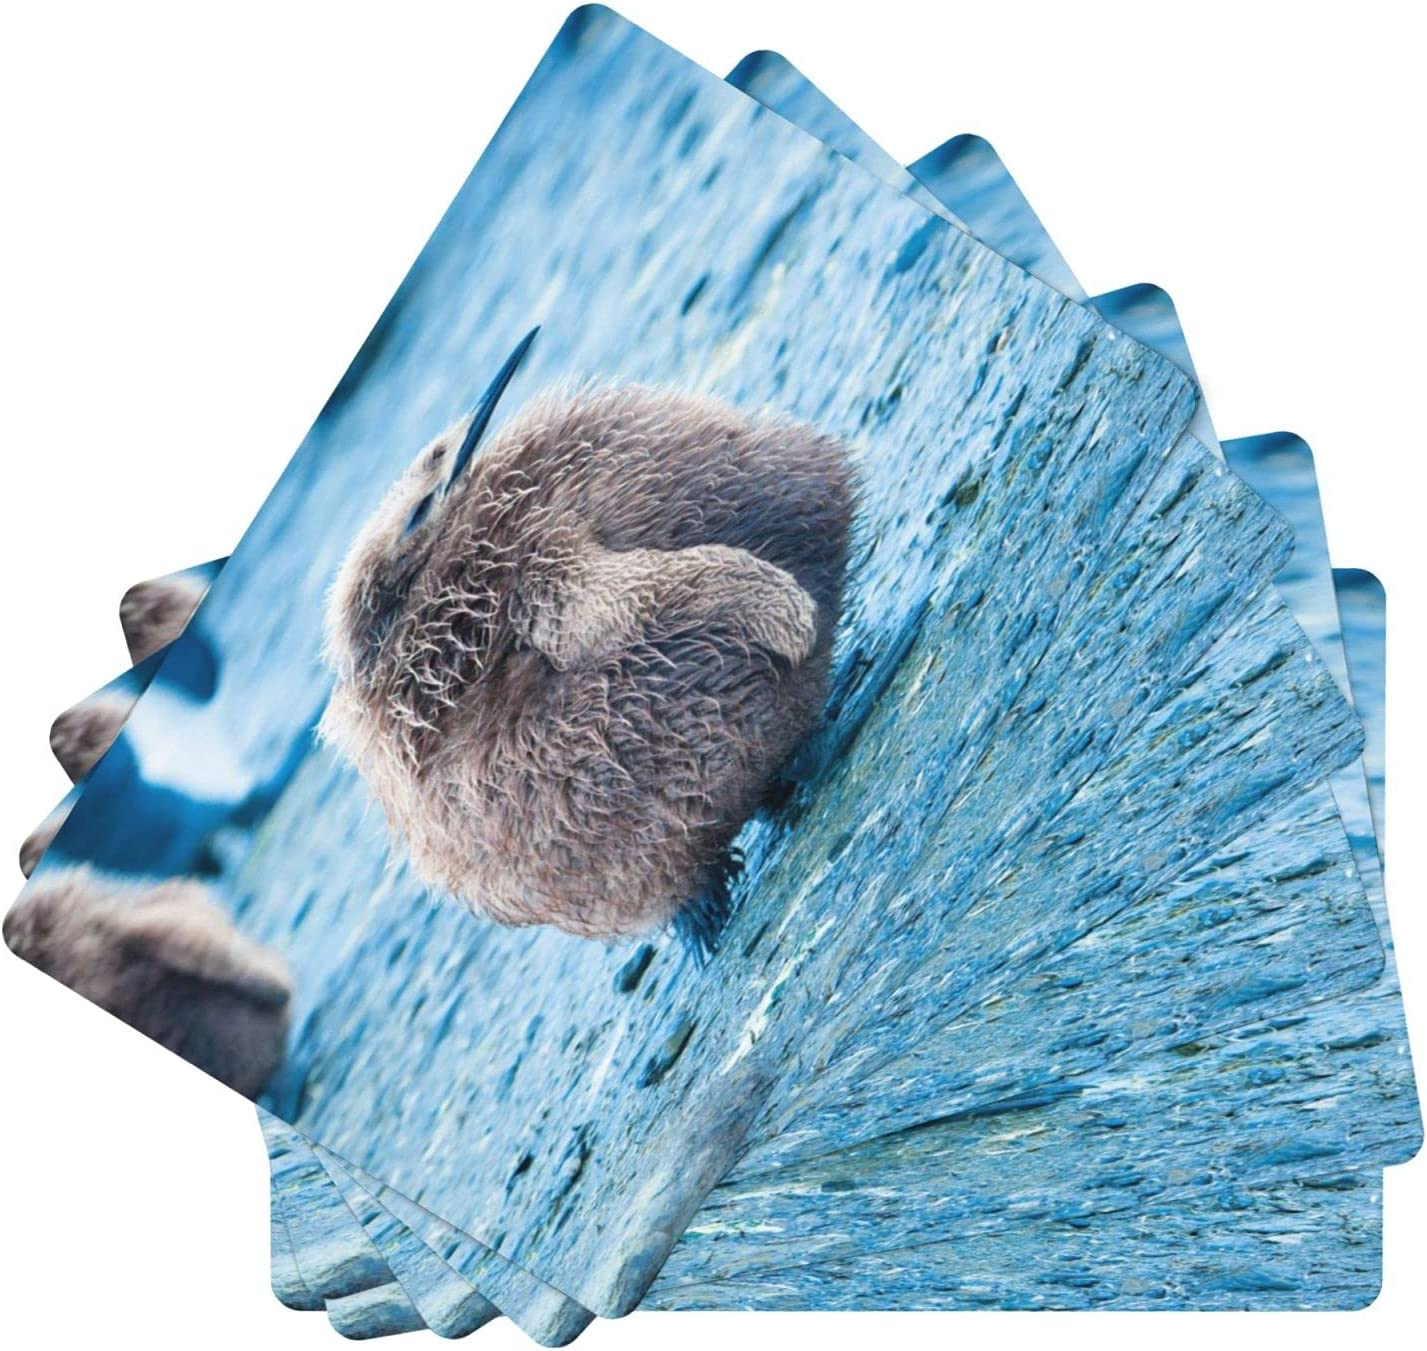 Cute Penguins Max 49% OFF Leather Table Mats Set Non-Slip [Alternative dealer] of Washable 6 Plac